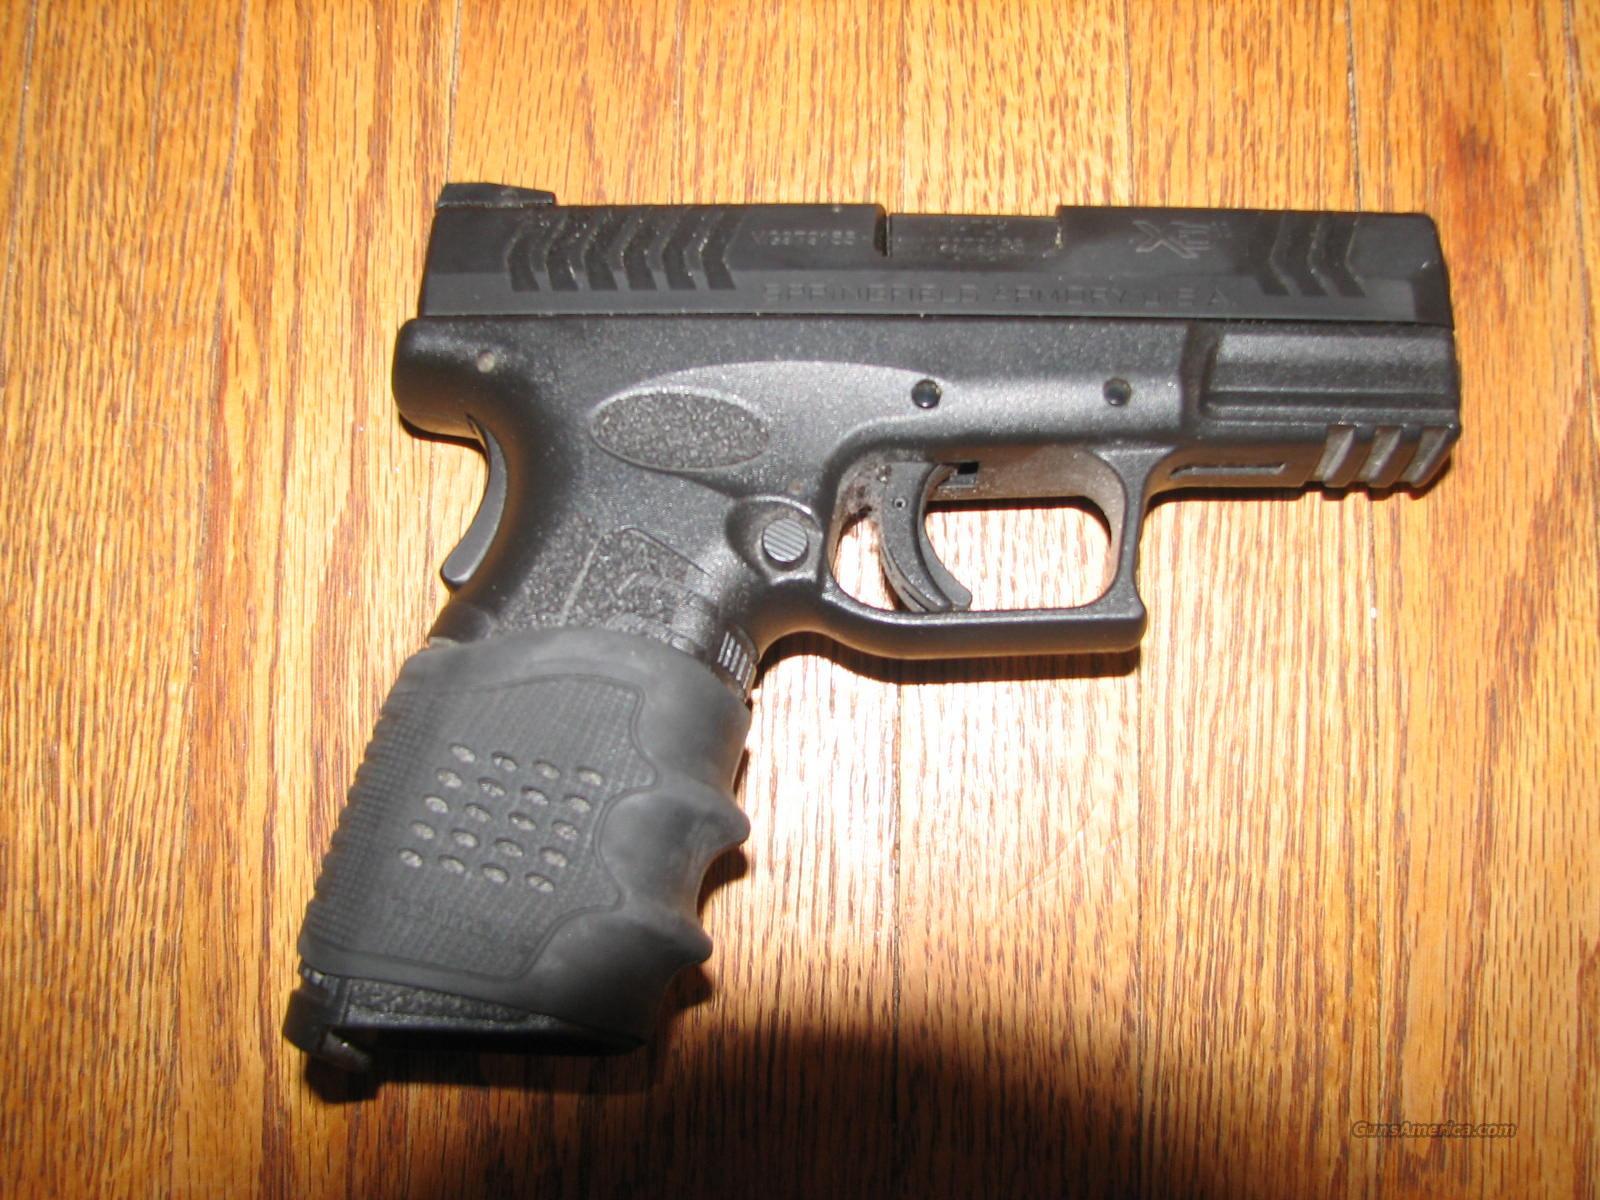 Springfield Armory XDM 9mm Pistol  Guns > Pistols > Springfield Armory Pistols > XD-M